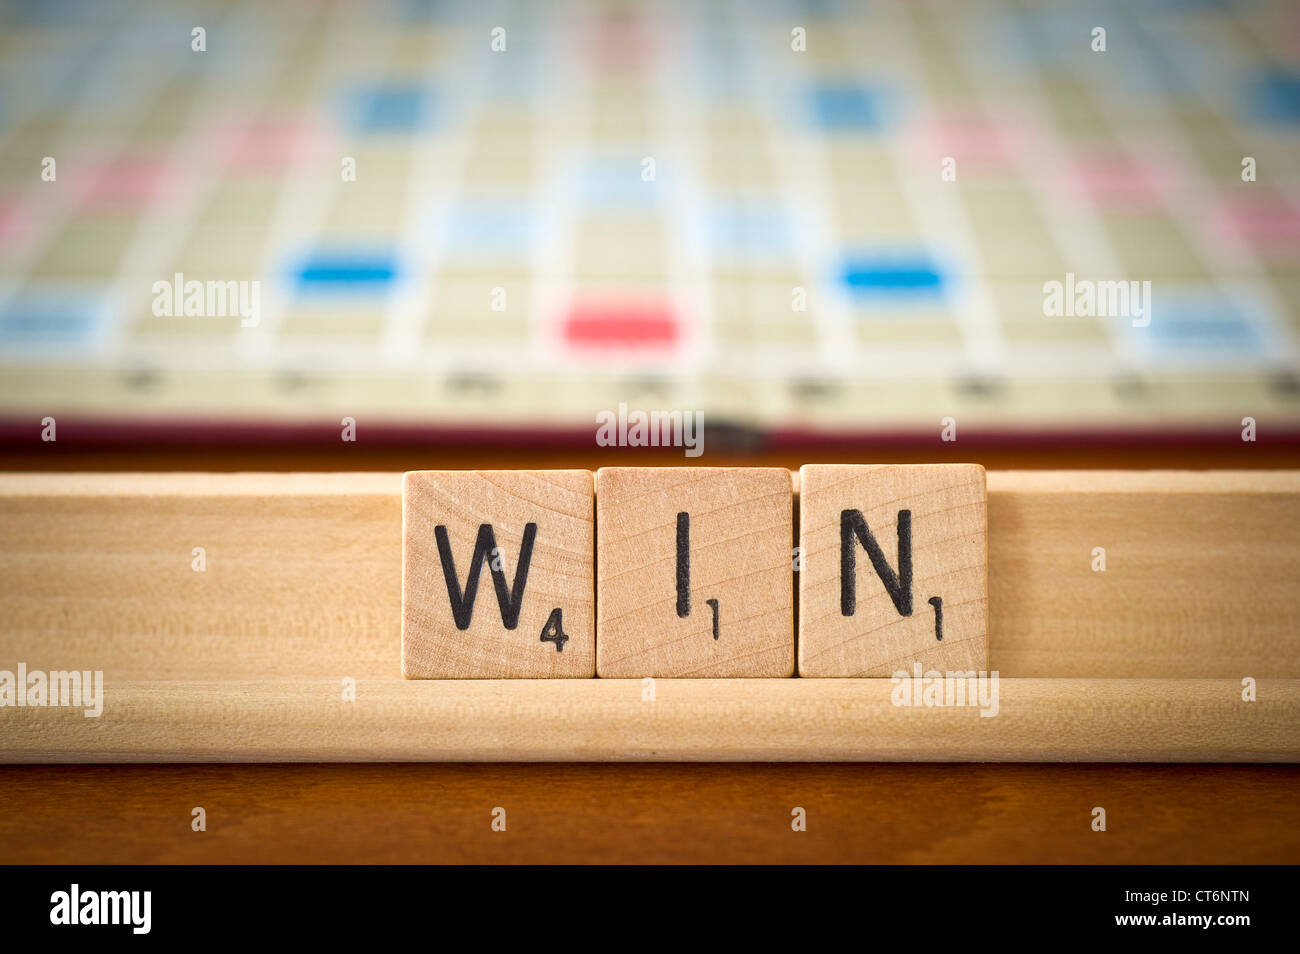 Win palabra deletreada con scrabble azulejos Imagen De Stock